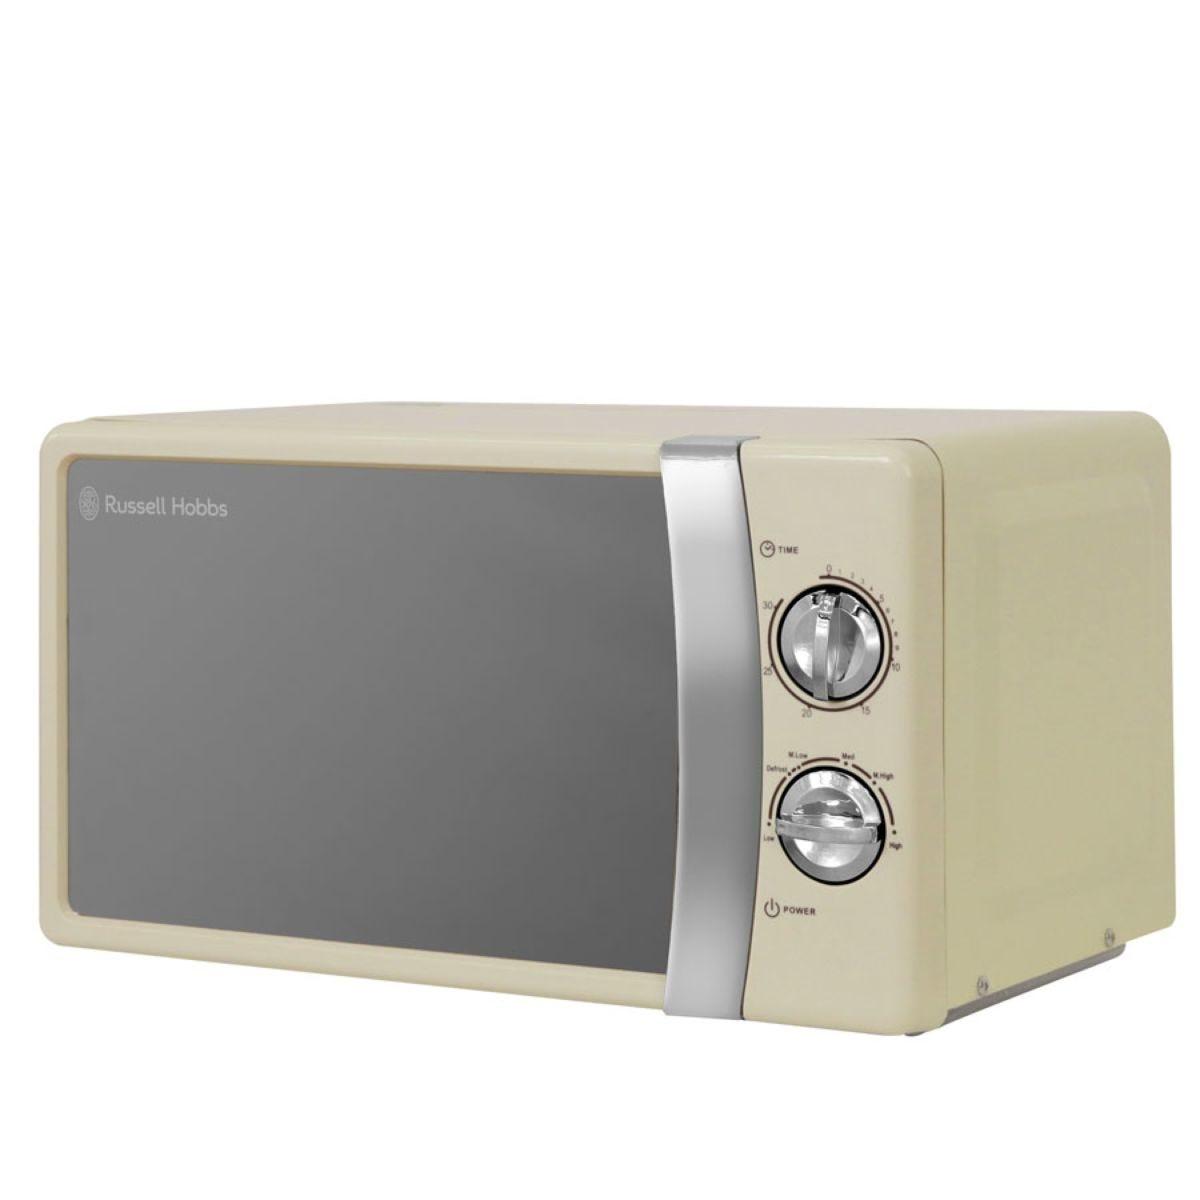 Russell Hobbs 700W 17L Manual Microwave - Cream